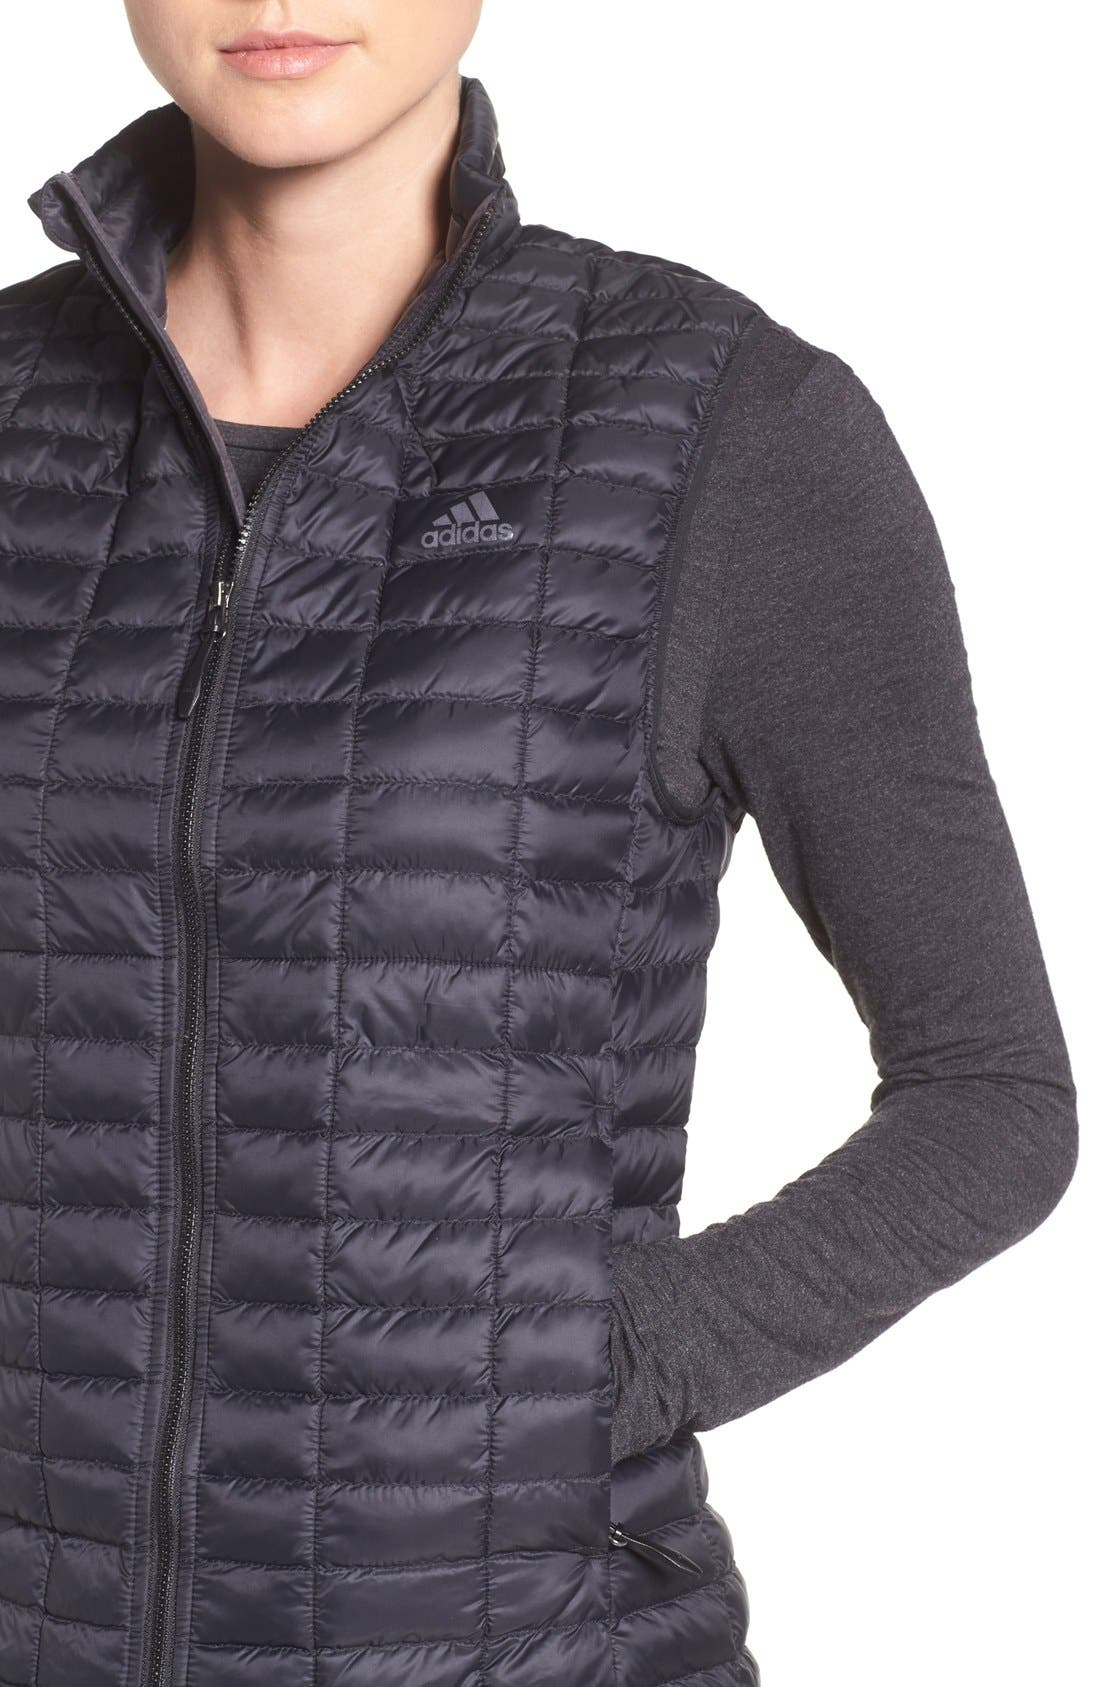 'Flyloft' Insulated Vest,                             Alternate thumbnail 4, color,                             001